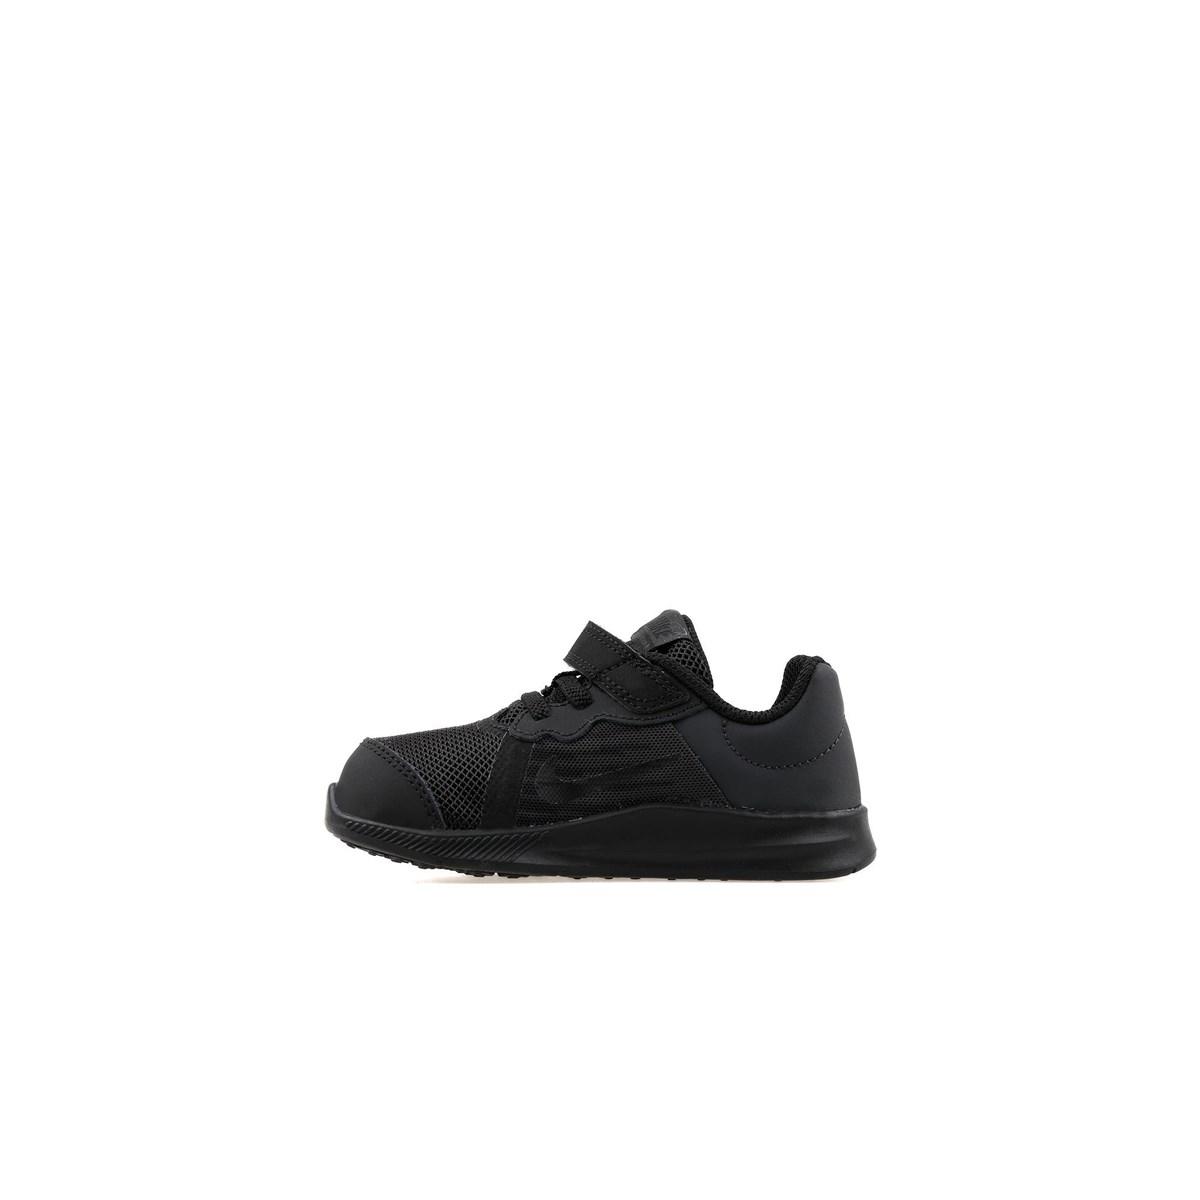 Downshifter 8 Bebek Siyah Spor Ayakkabı (922856-006)